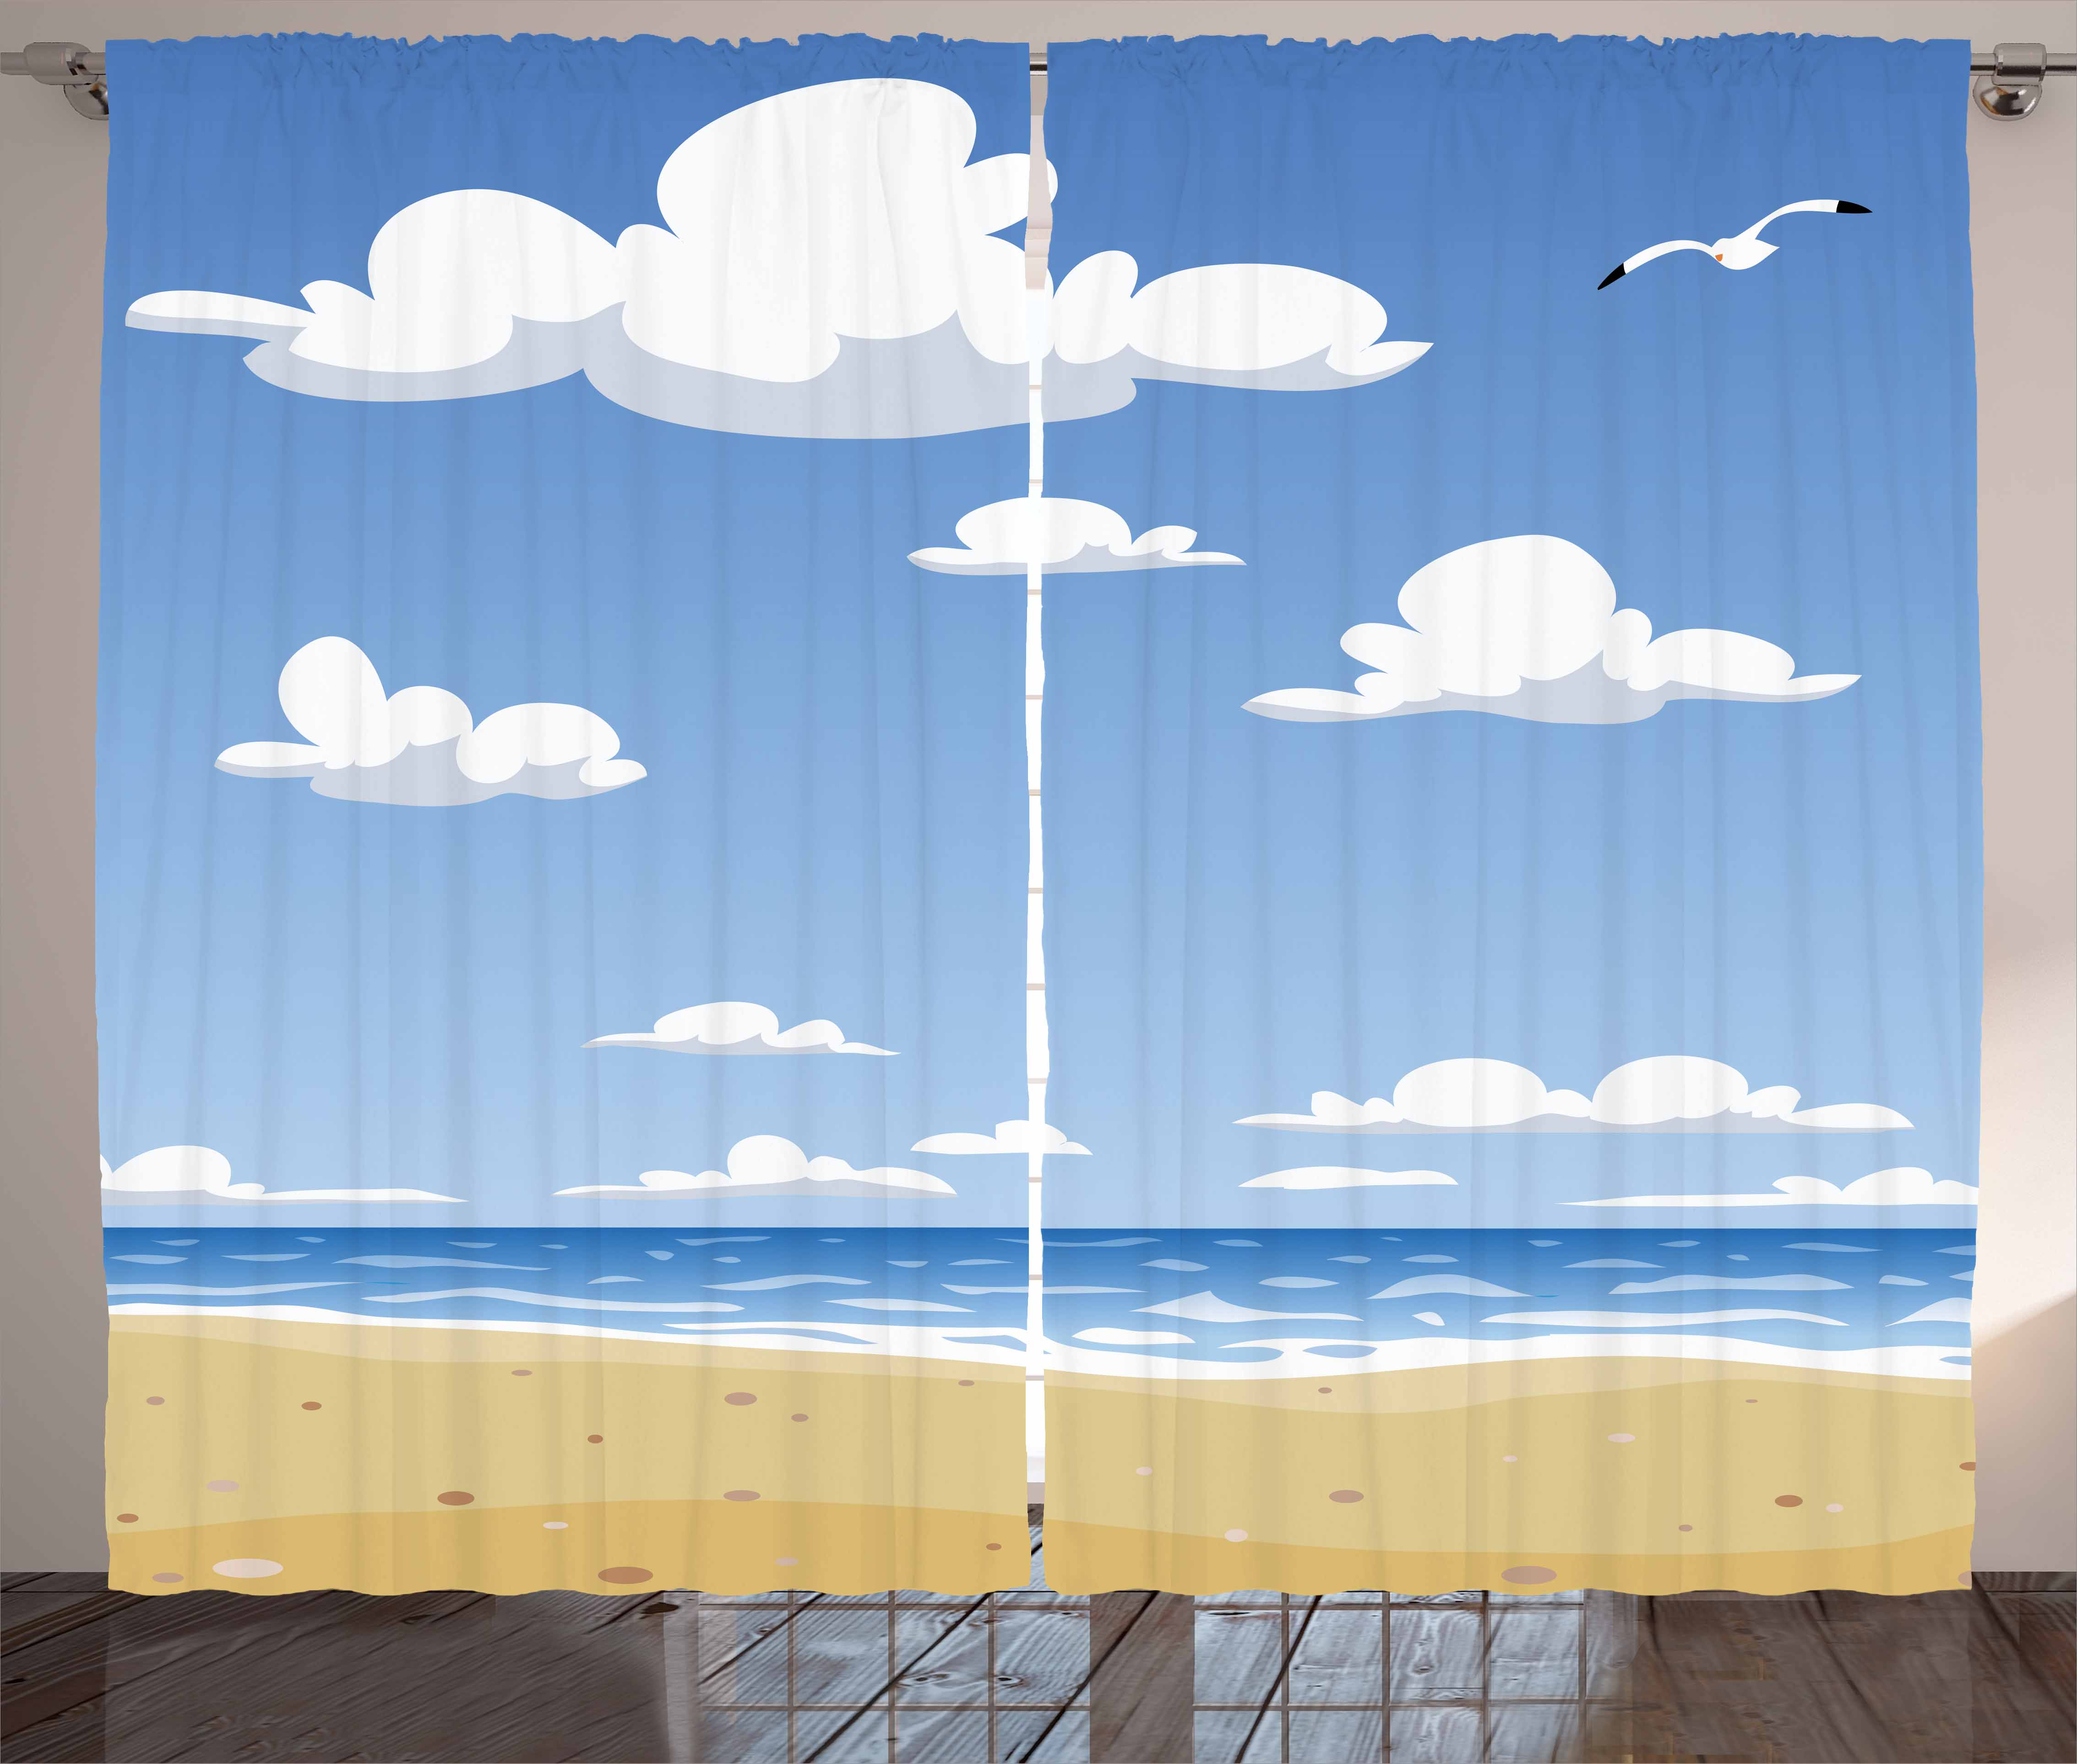 Beach Curtains 2 Panels Set, Cartoon Style Beach Pattern